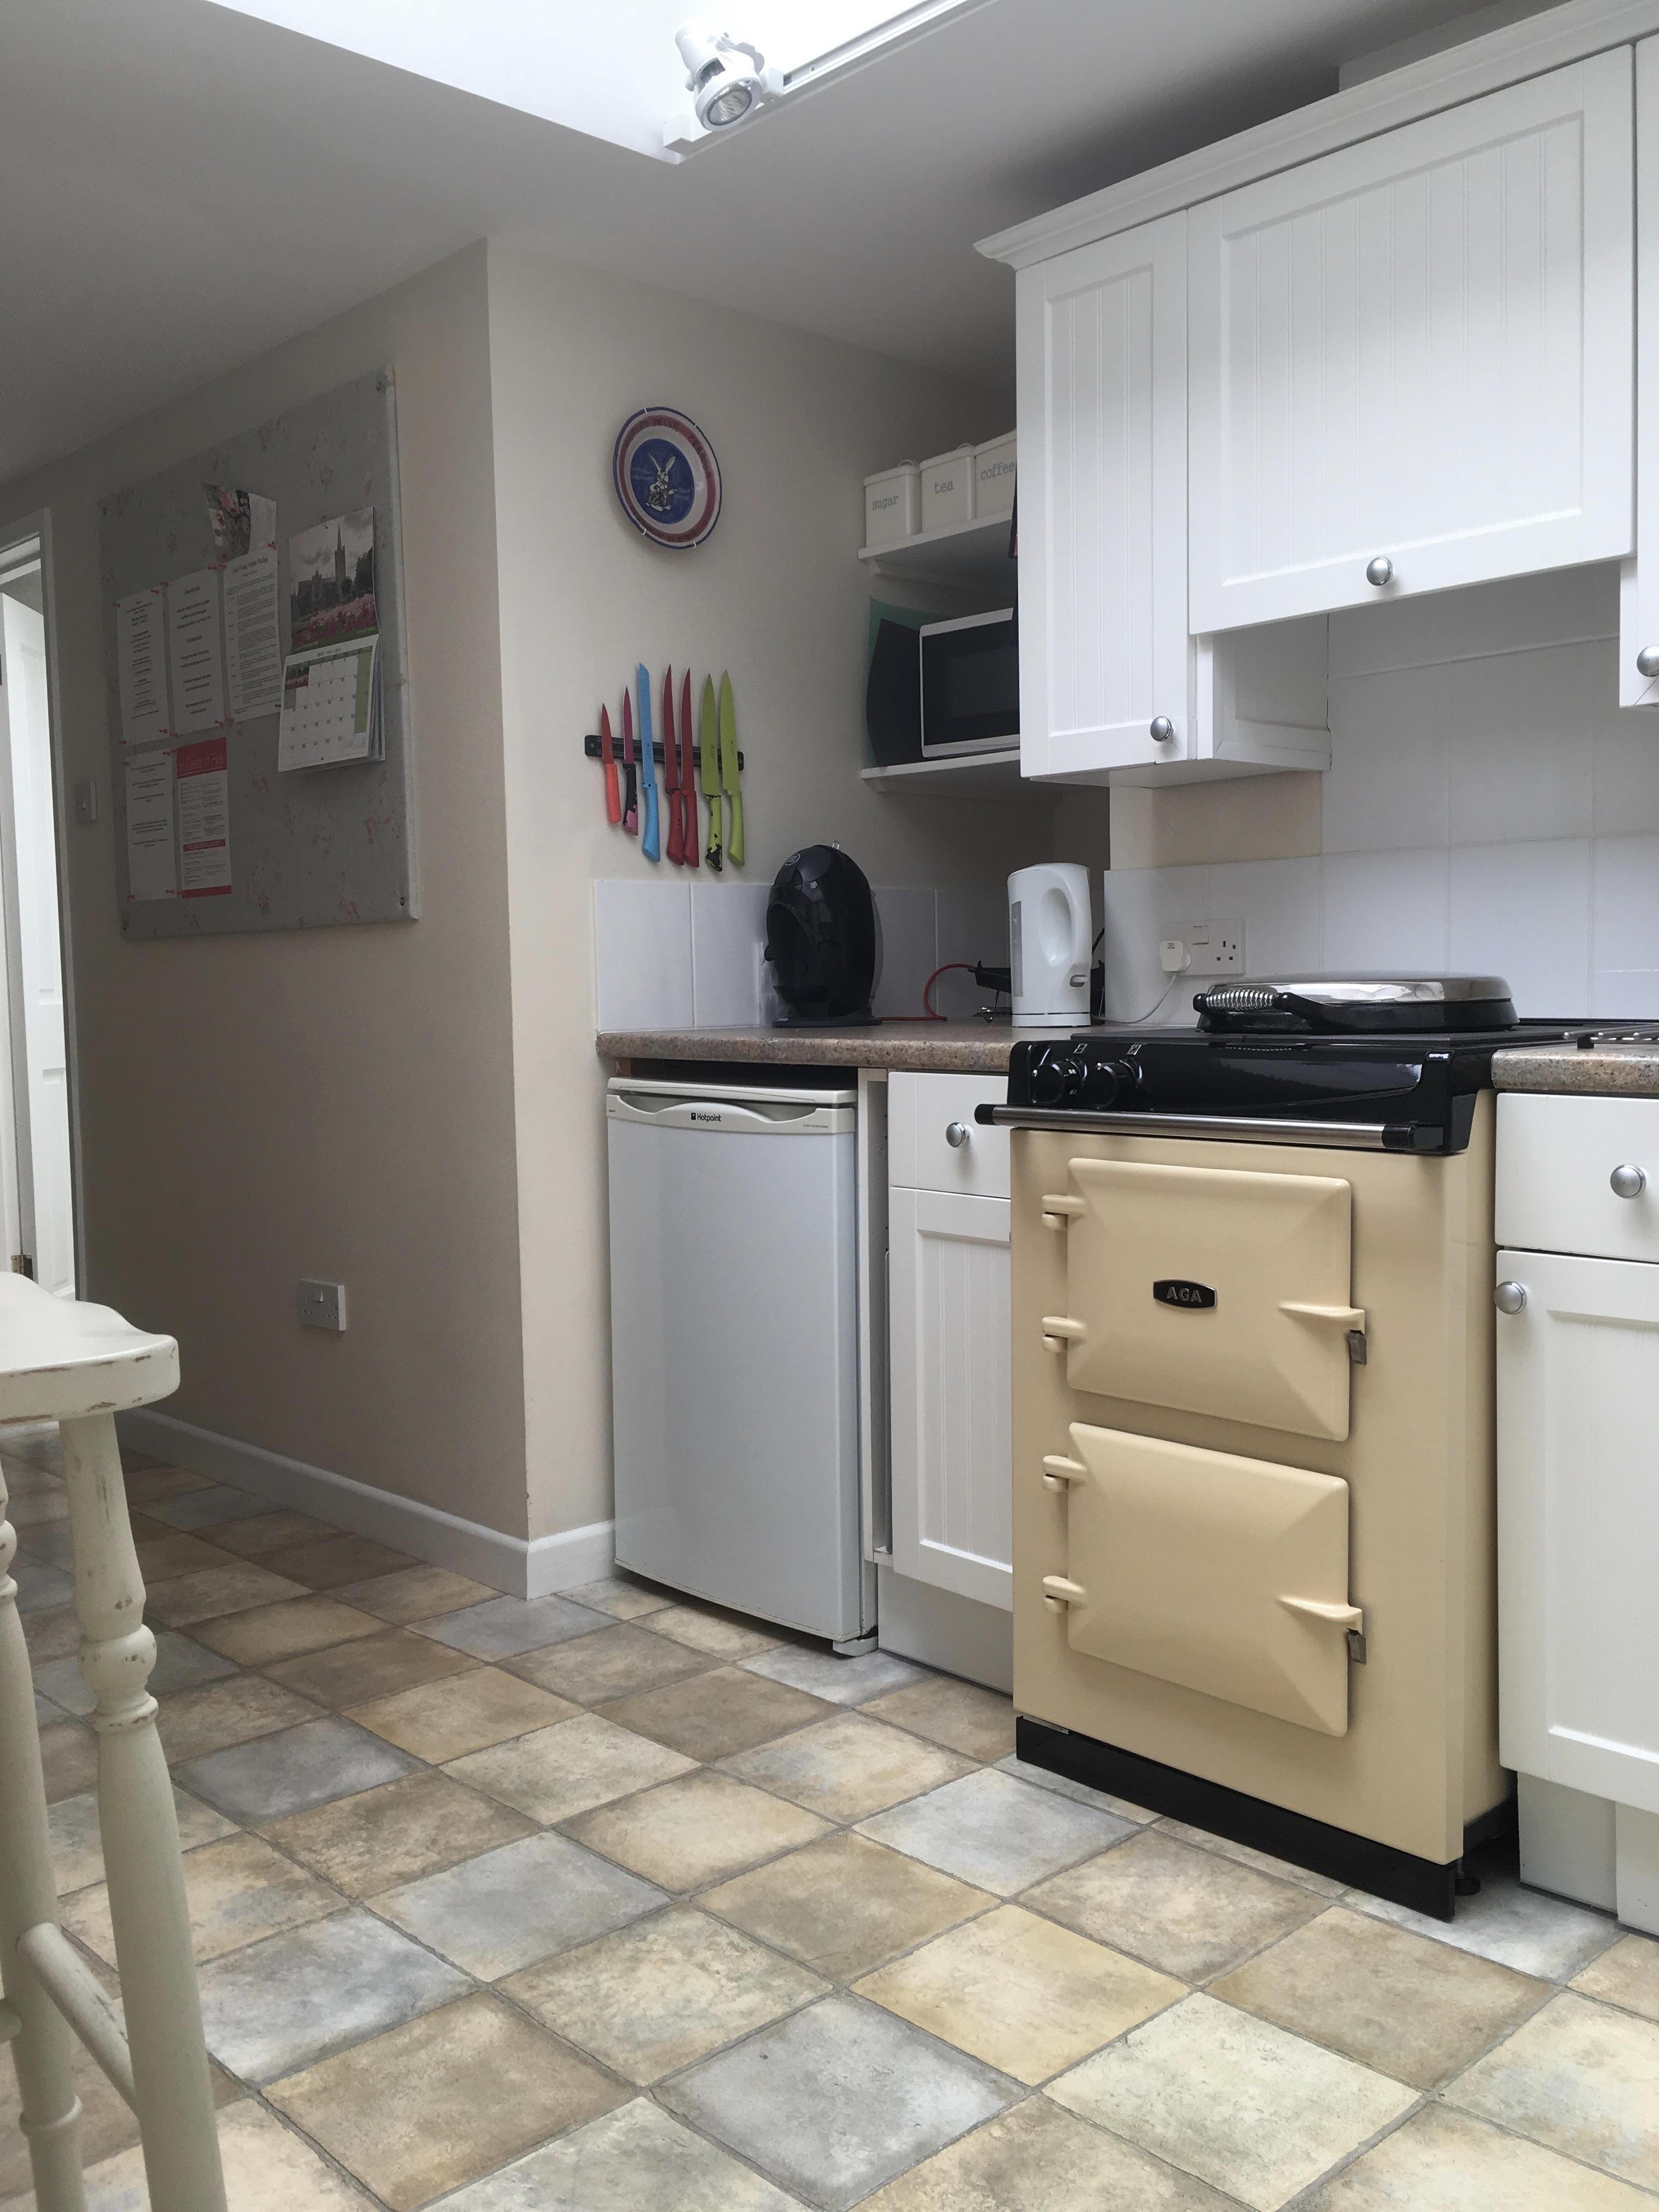 The Kitchen II